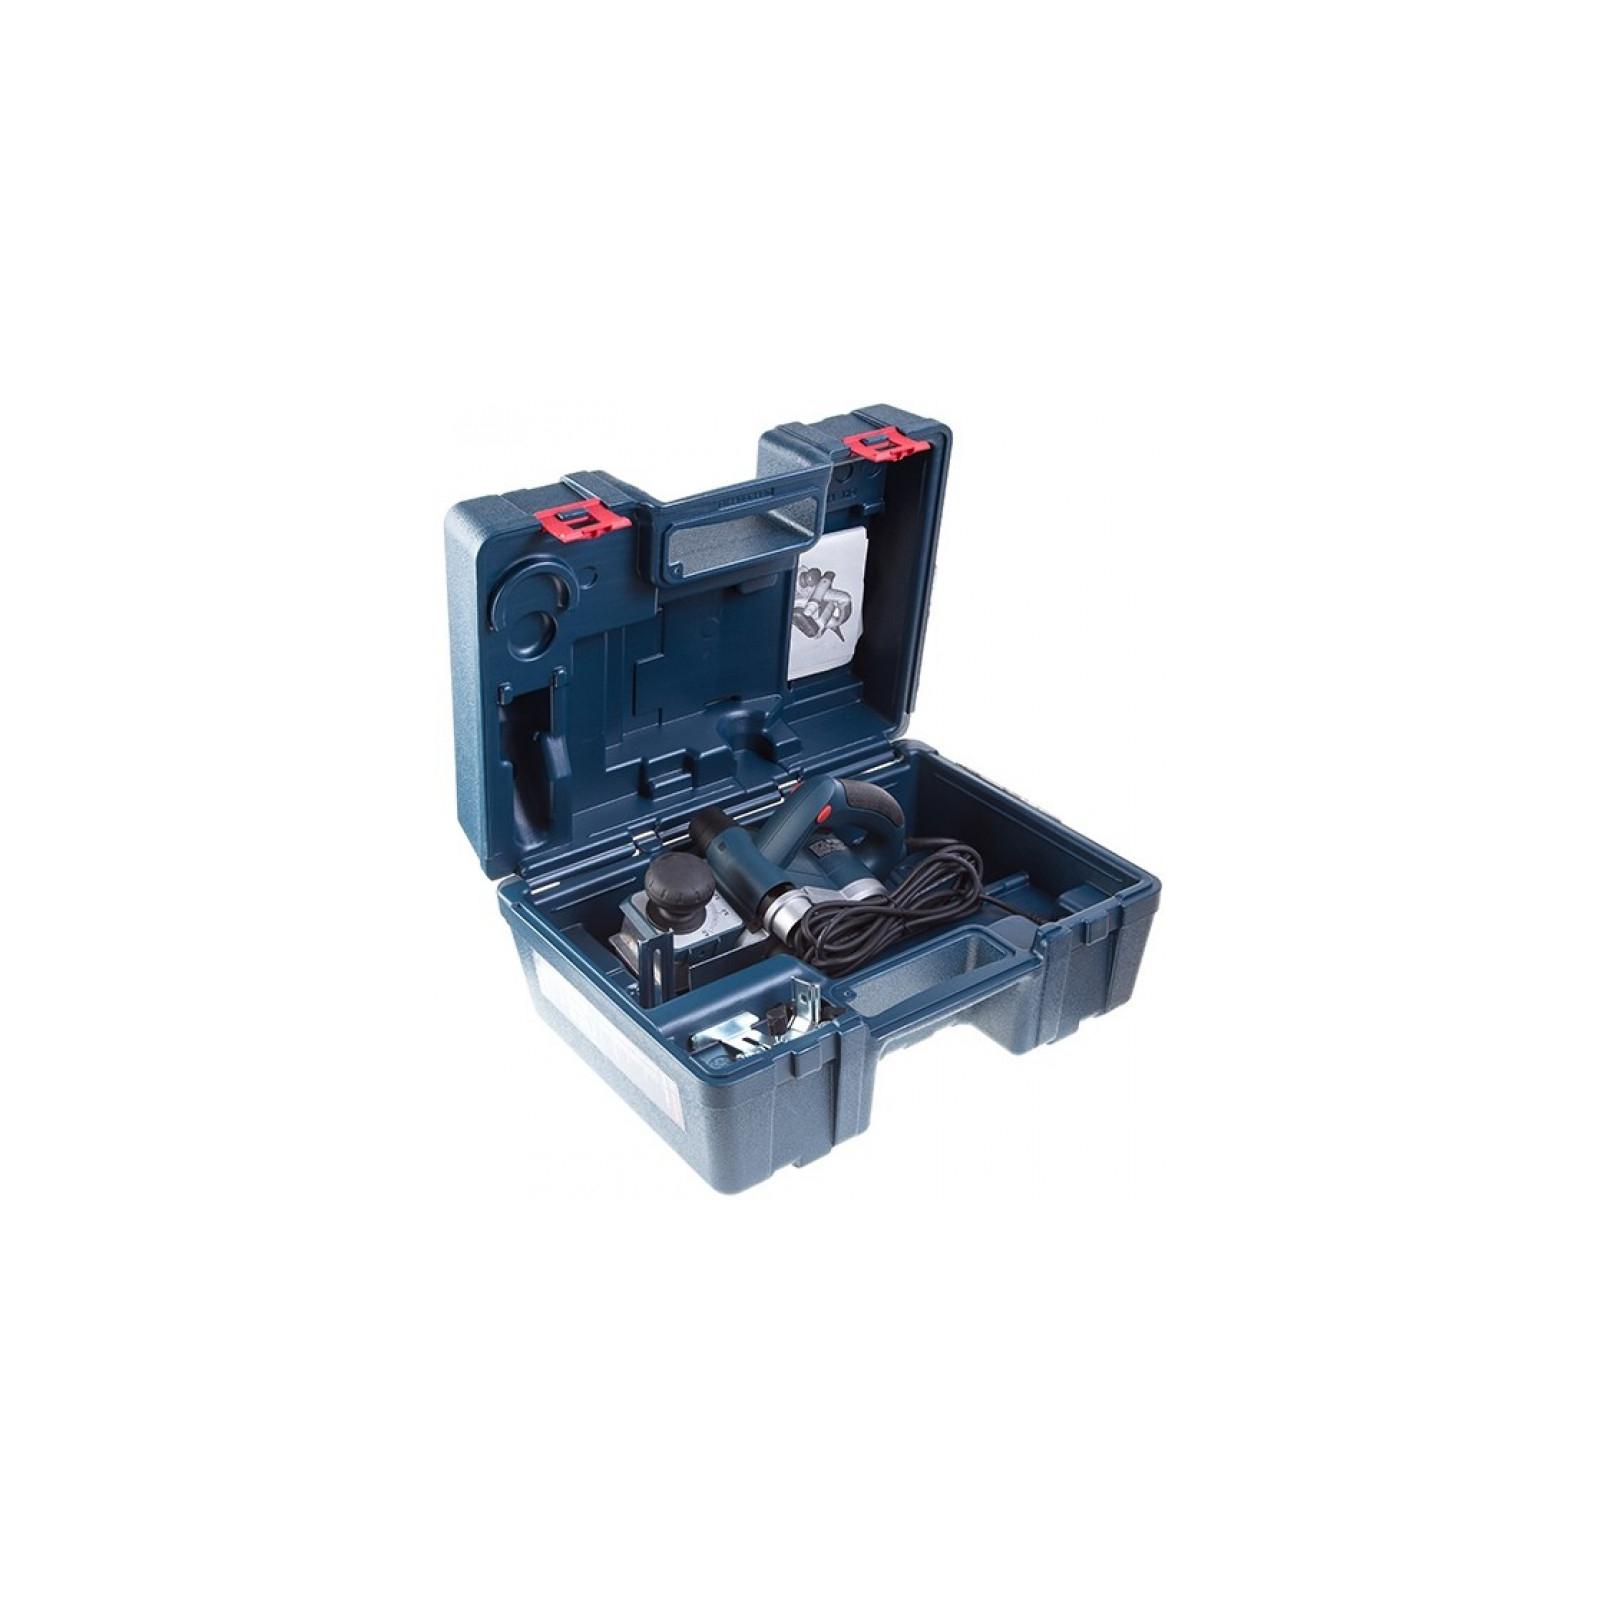 Электрорубанок Bosch GHO 40-82 C Professional (0.601.59A.760) изображение 6